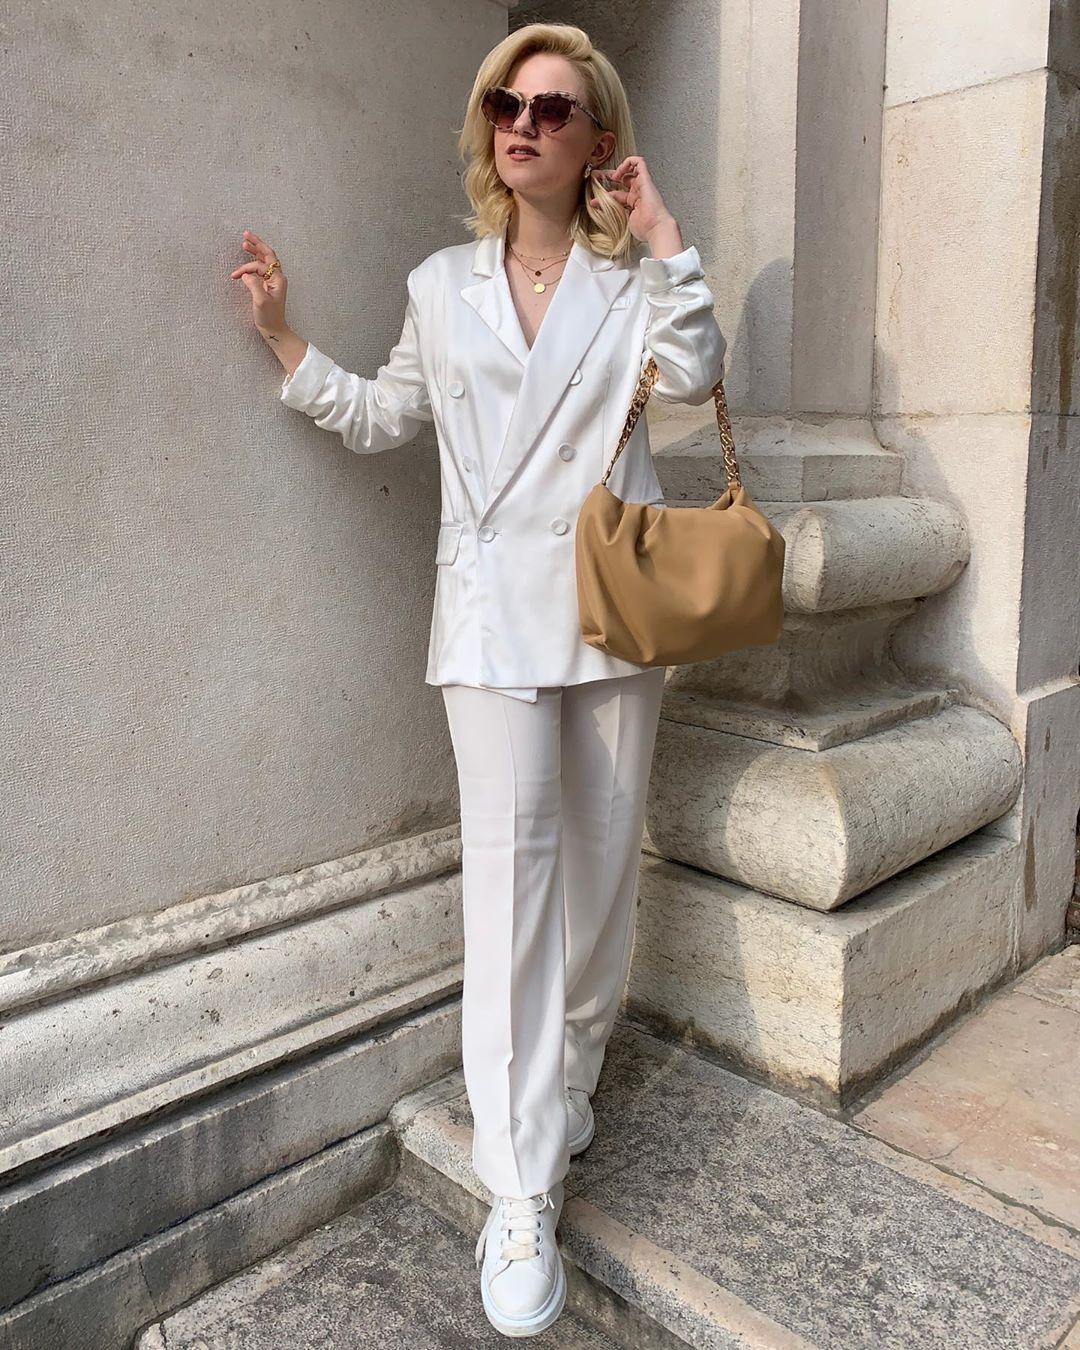 Angel • • #allwhite#whitefashion#outfitgram#ootdmagazine#americanstyle#paris#parisianstyle#parisfrance#lesparisiennesdumonde#laparisienne#aestheticstyle#vintage#vintagestyle#mango#mangofashion#alexandermcqueensneakers#bershkacollection#nyc#howtobeparisian#